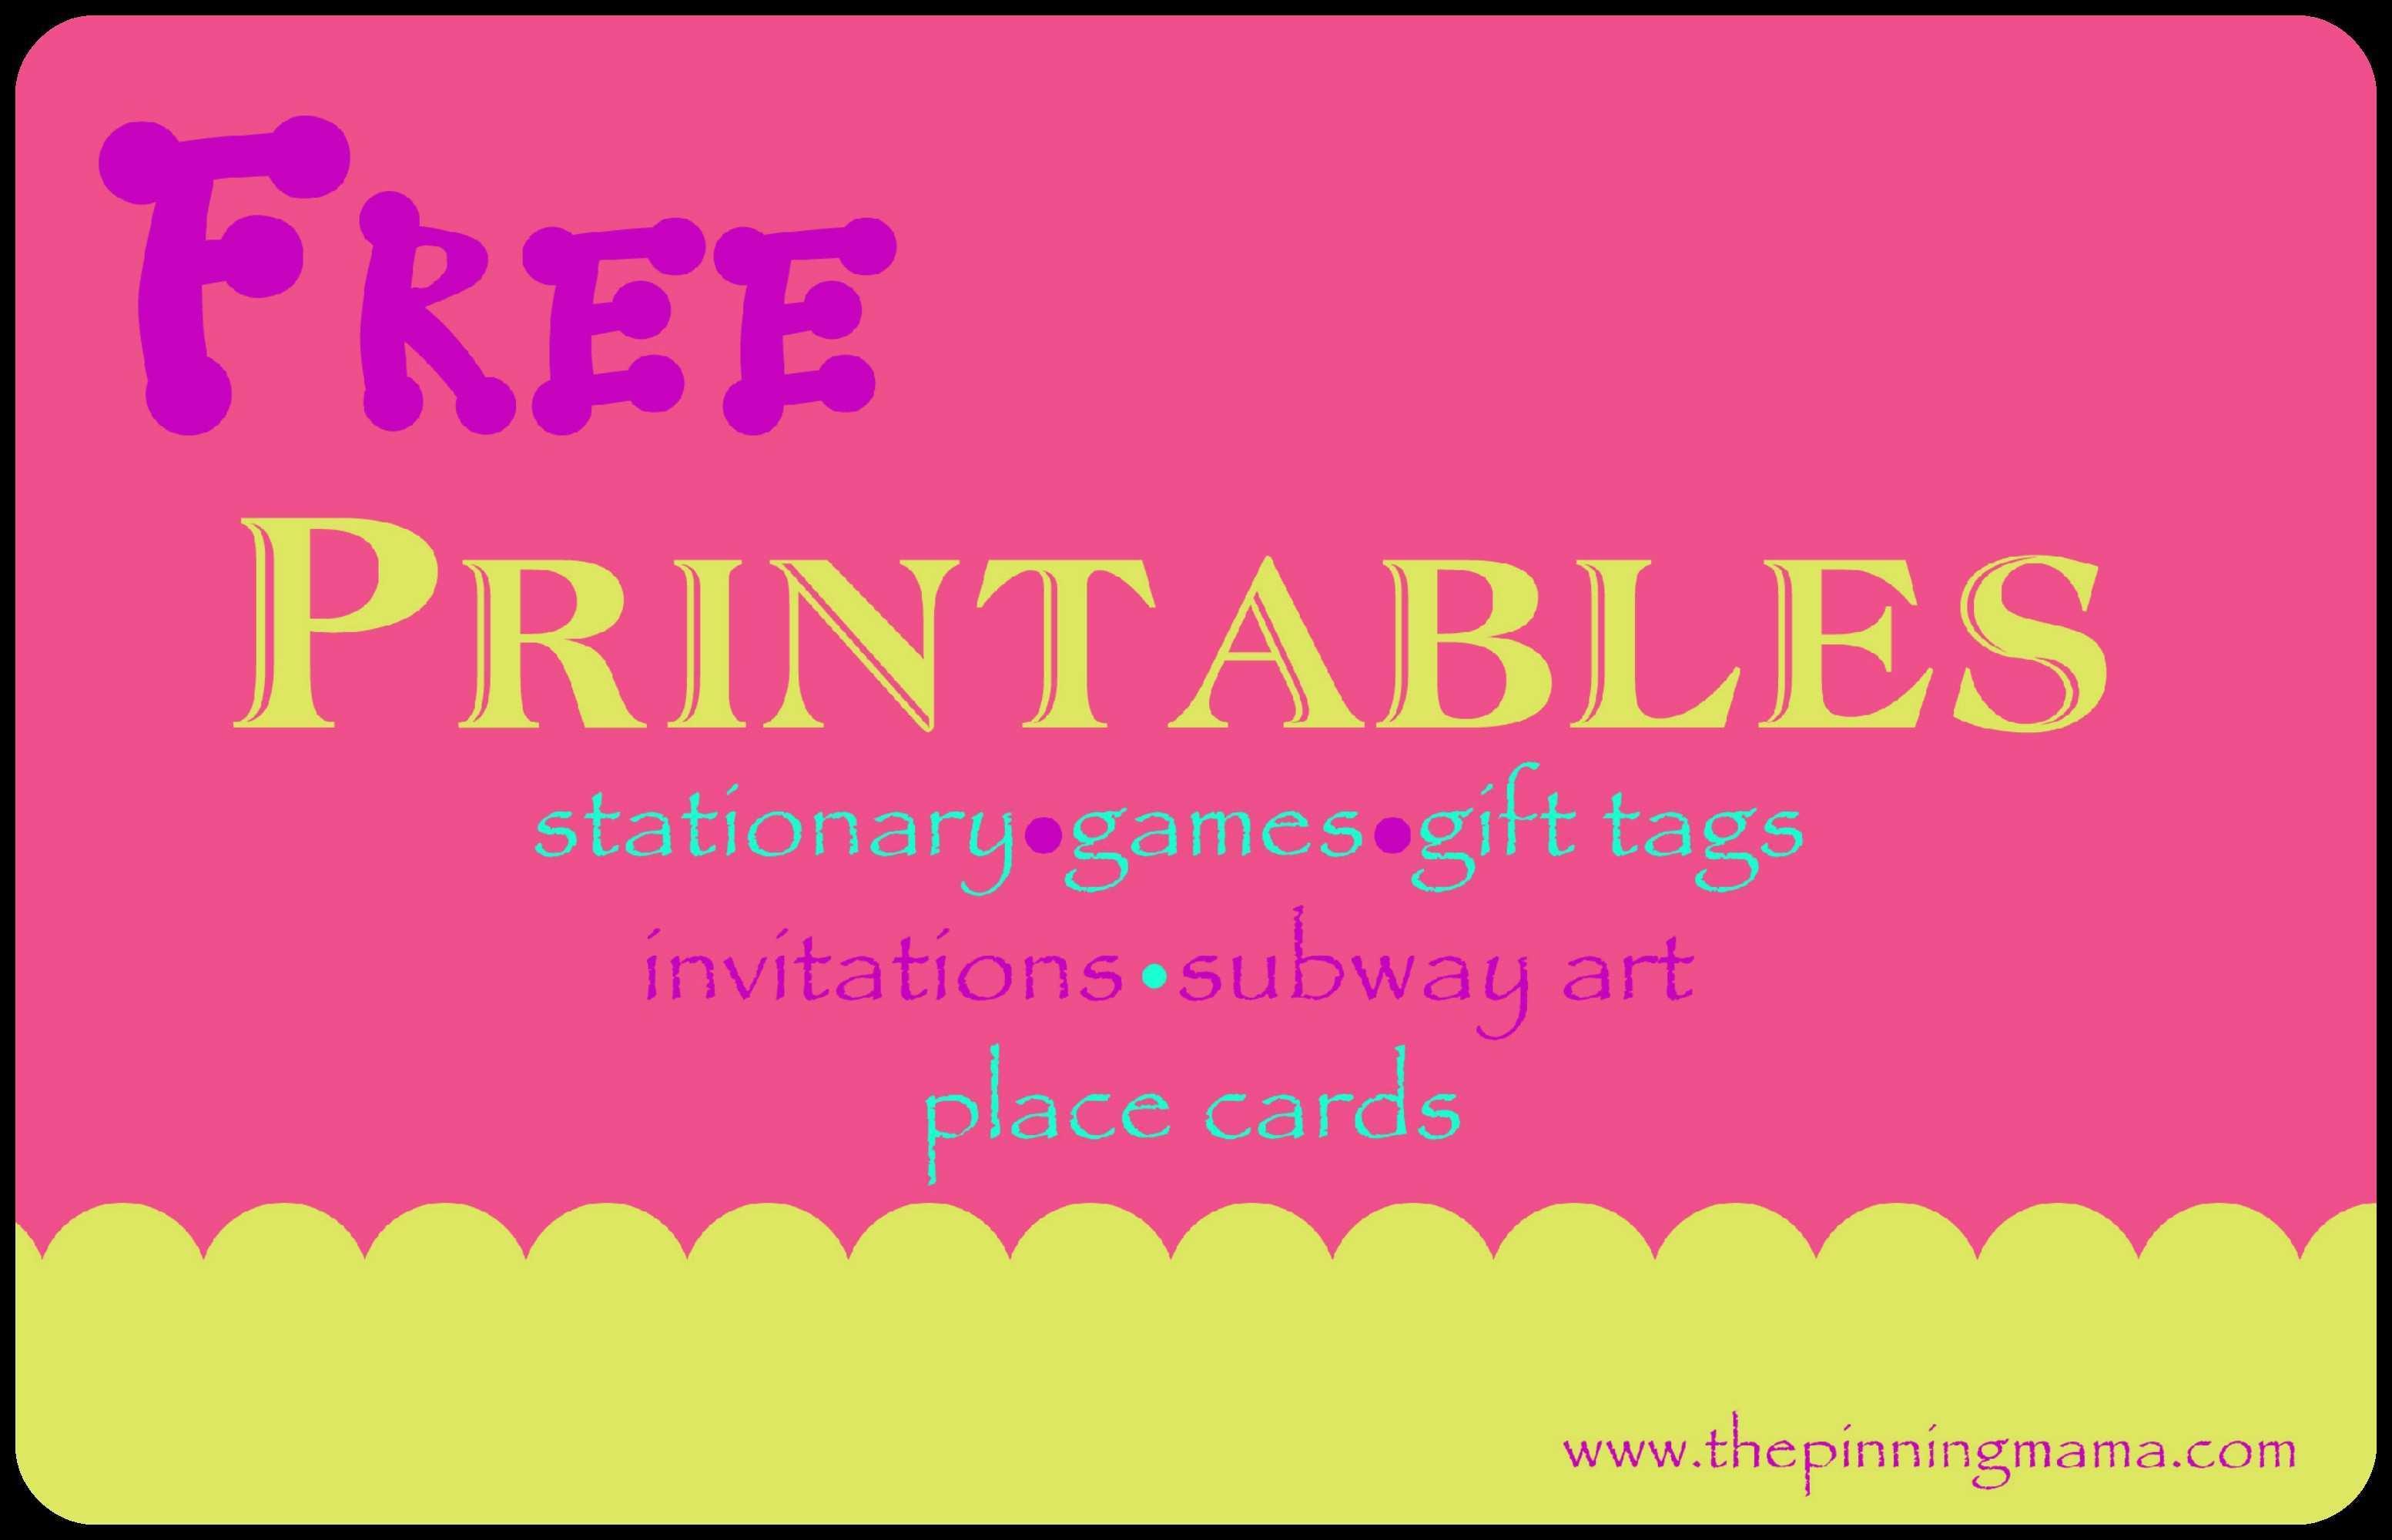 43 Best Free Printable Birthday Invitation Templates Uk For Ms Word With Free Printable Birthday Invitation Templates Uk Cards Design Templates